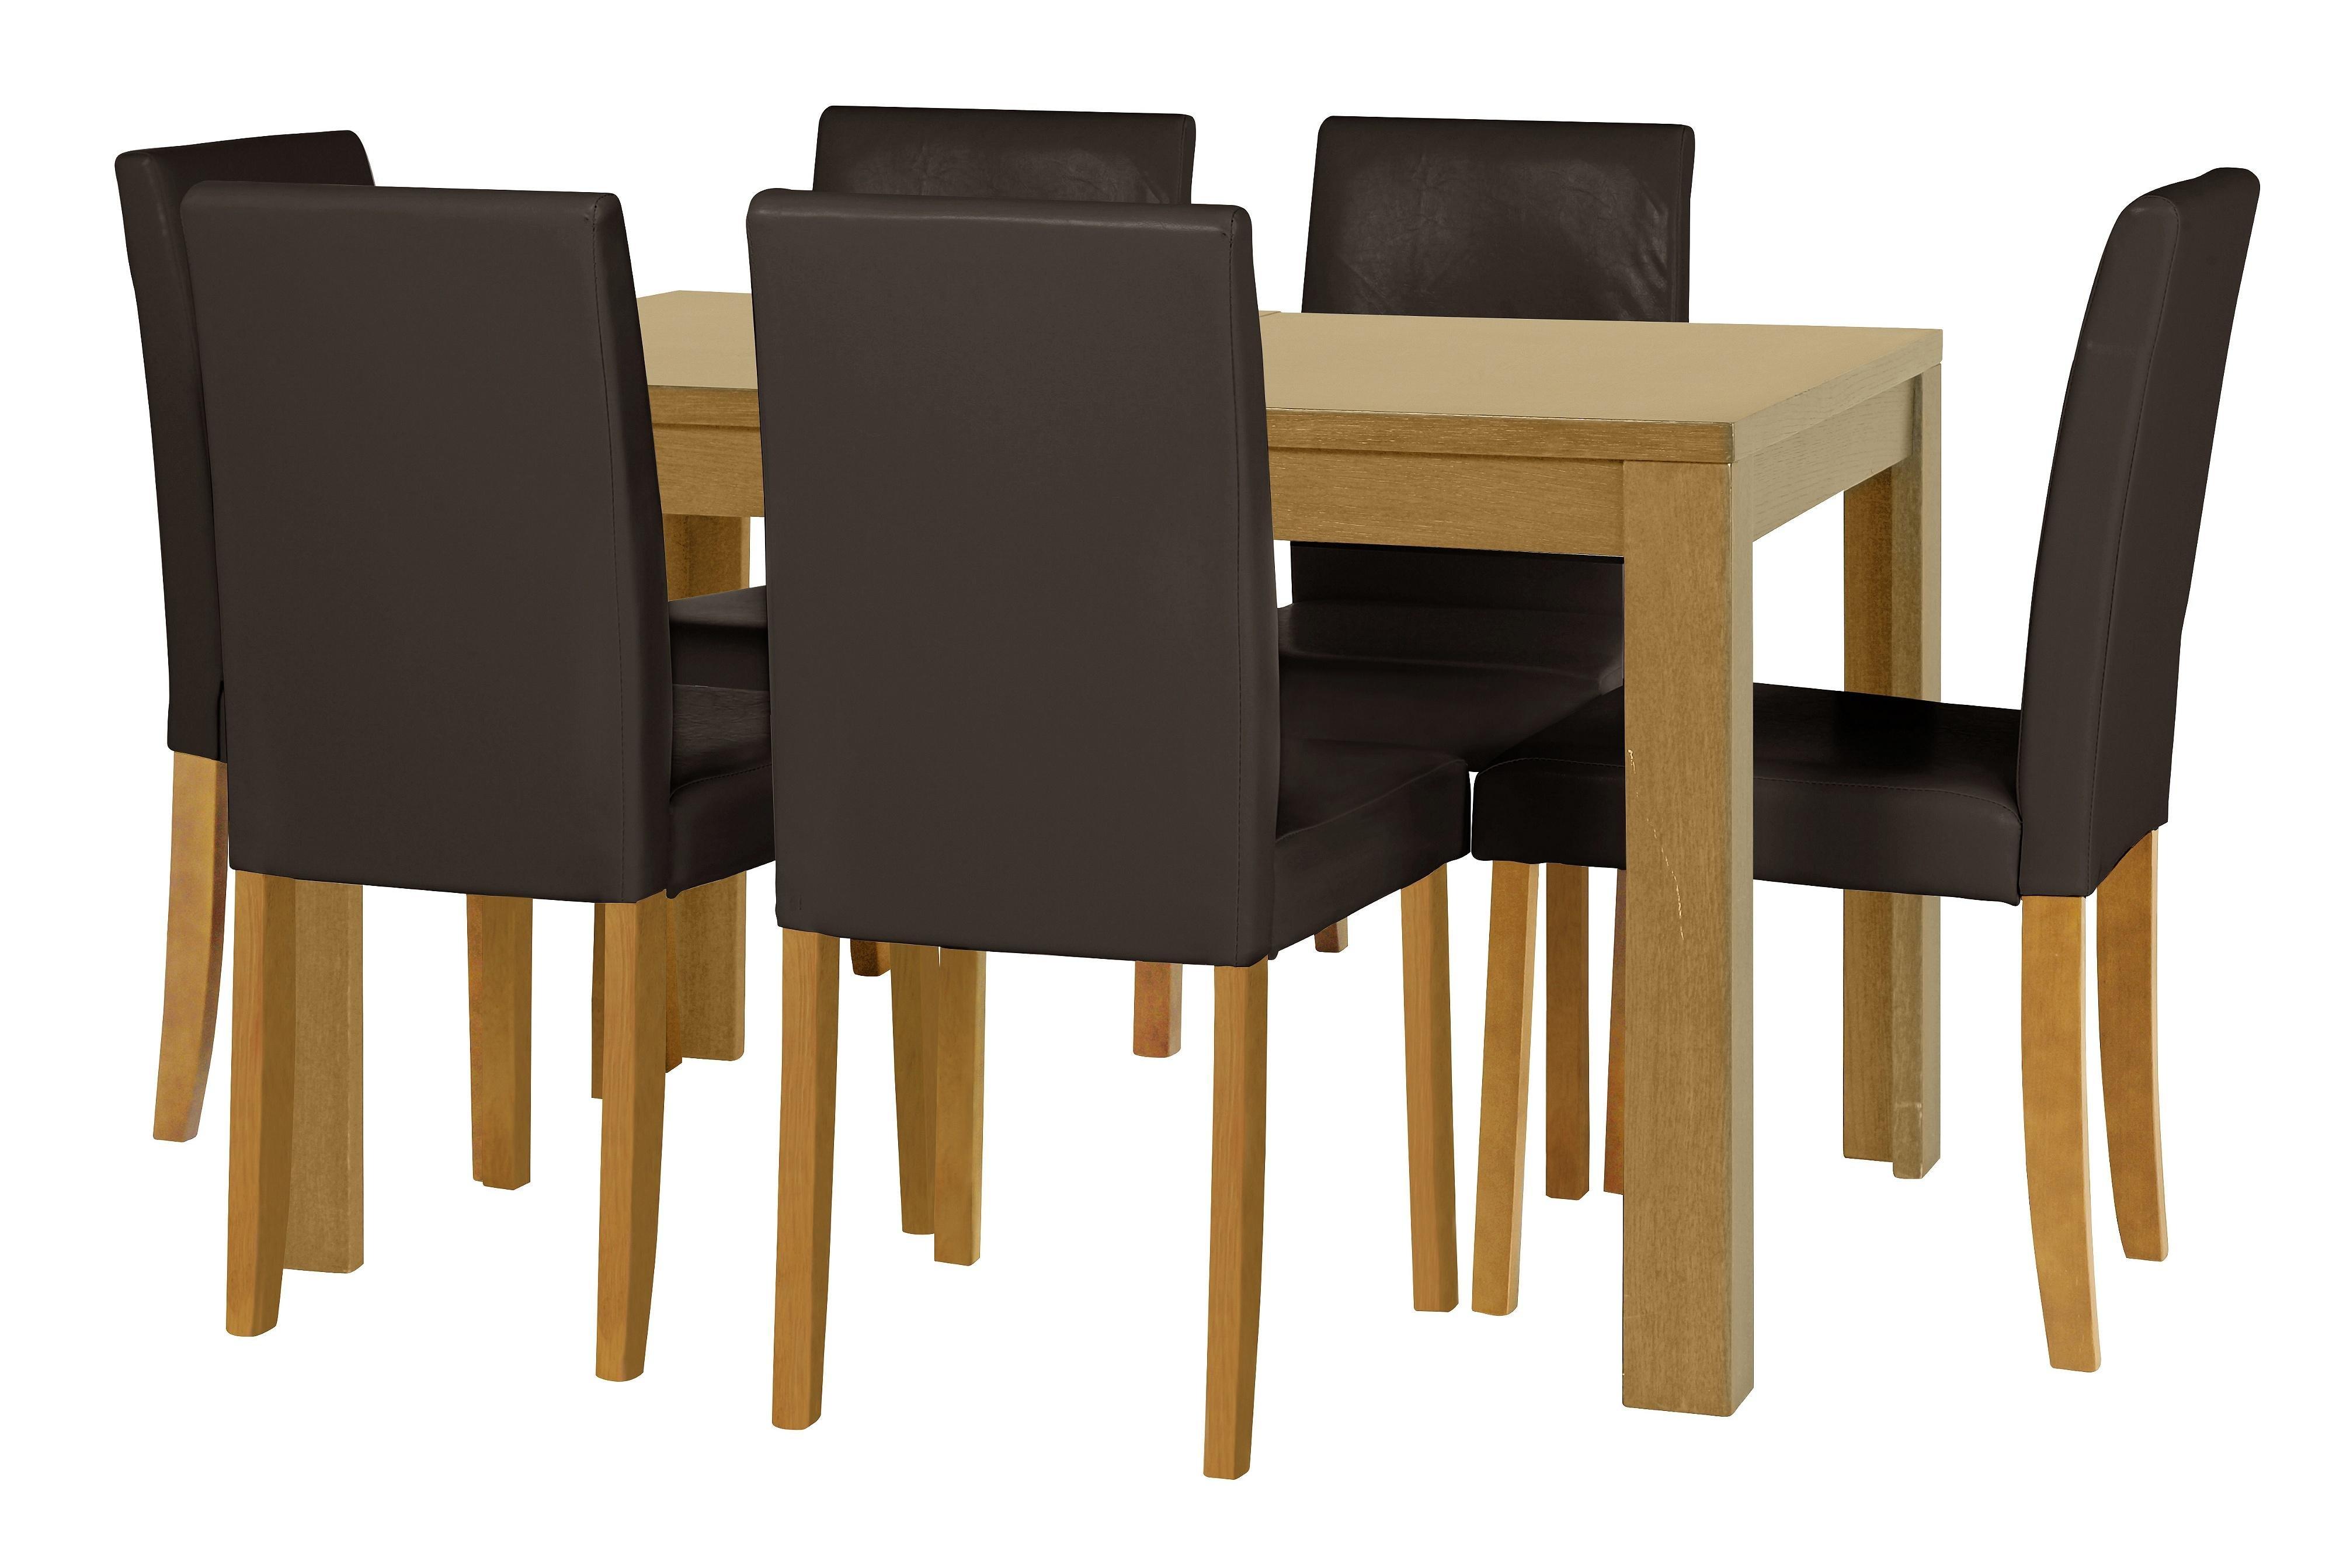 Buy HOME Penley Oak Veneer Ext Dining Table   Chairs - Choc at